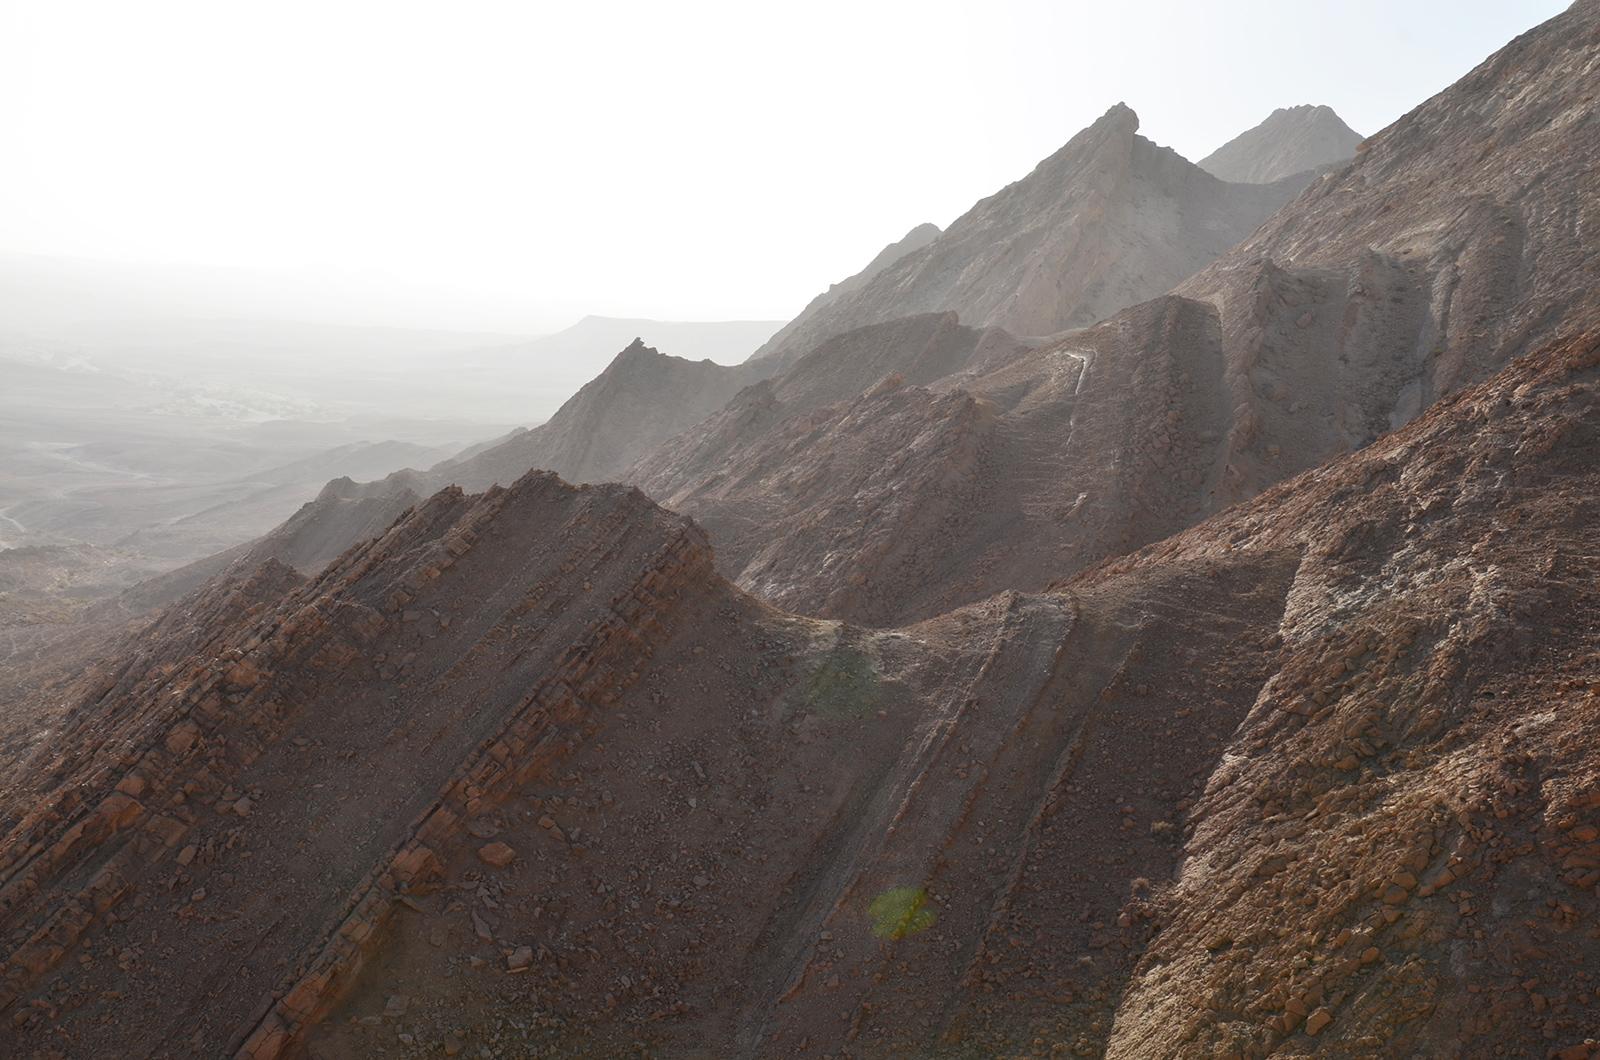 síla matky přírody, Negevská poušť, Izrael